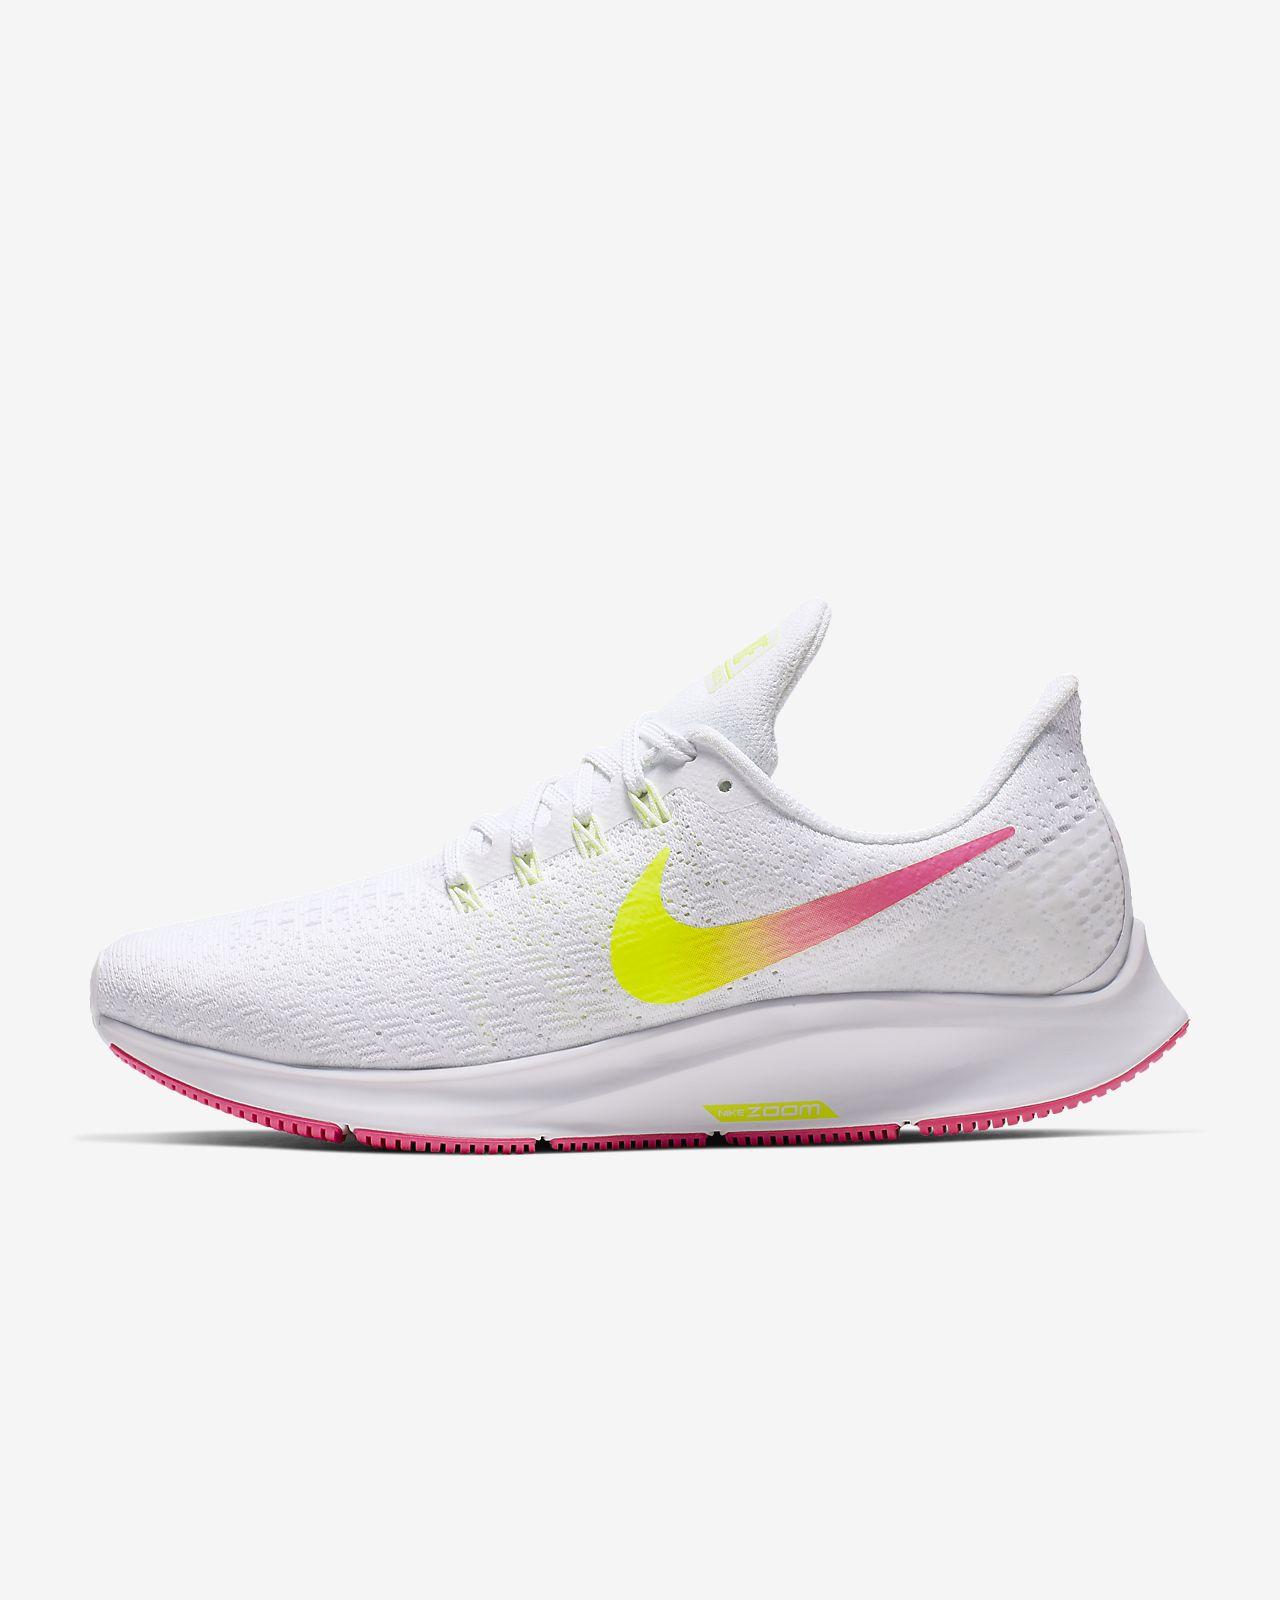 Chaussure de running Nike Air Zoom Pegasus 35 pour Femme